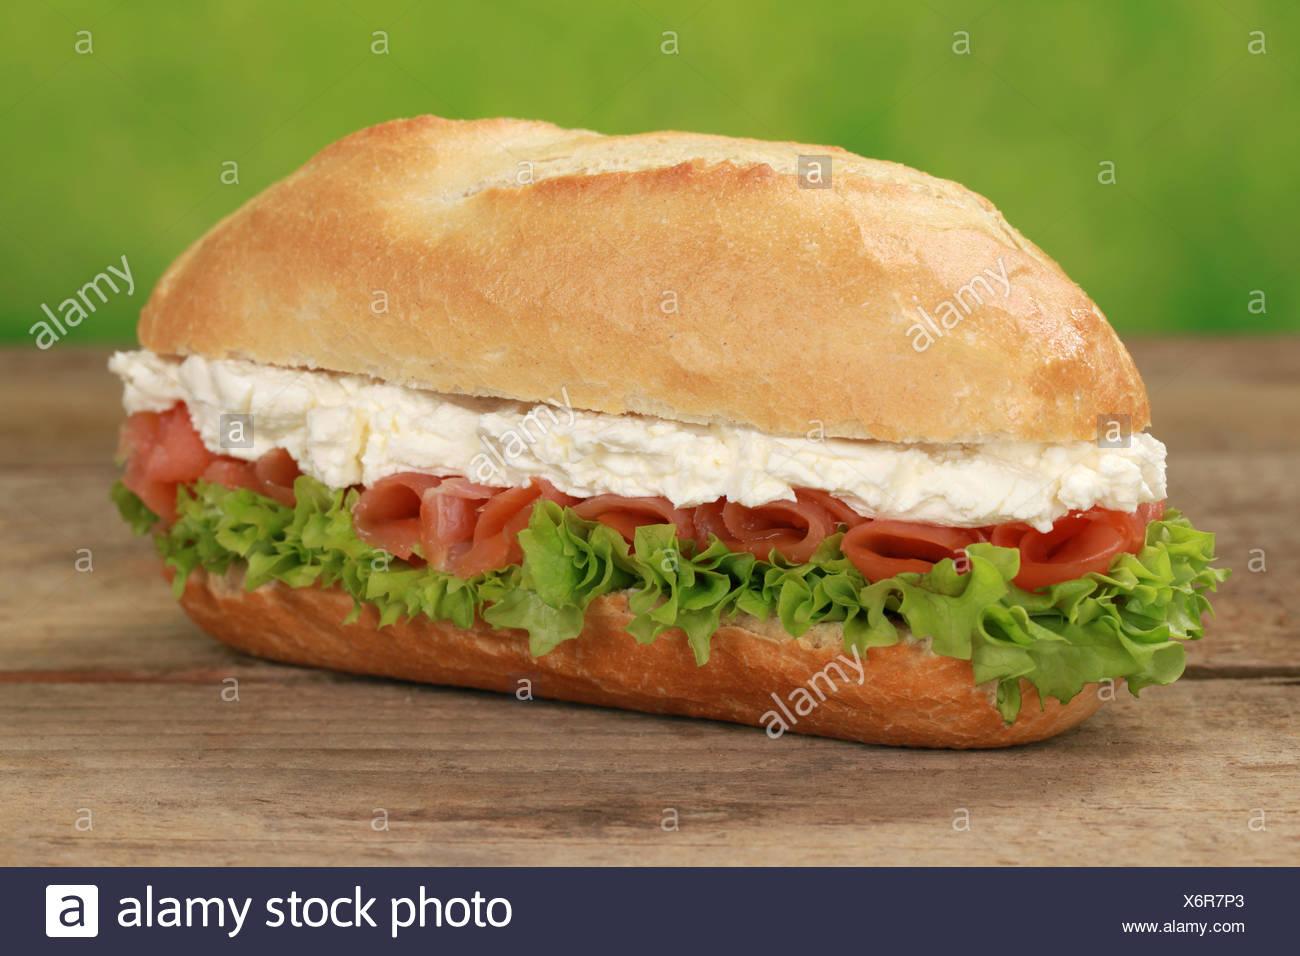 Sub Sandwich mit Lachs - Stock Image